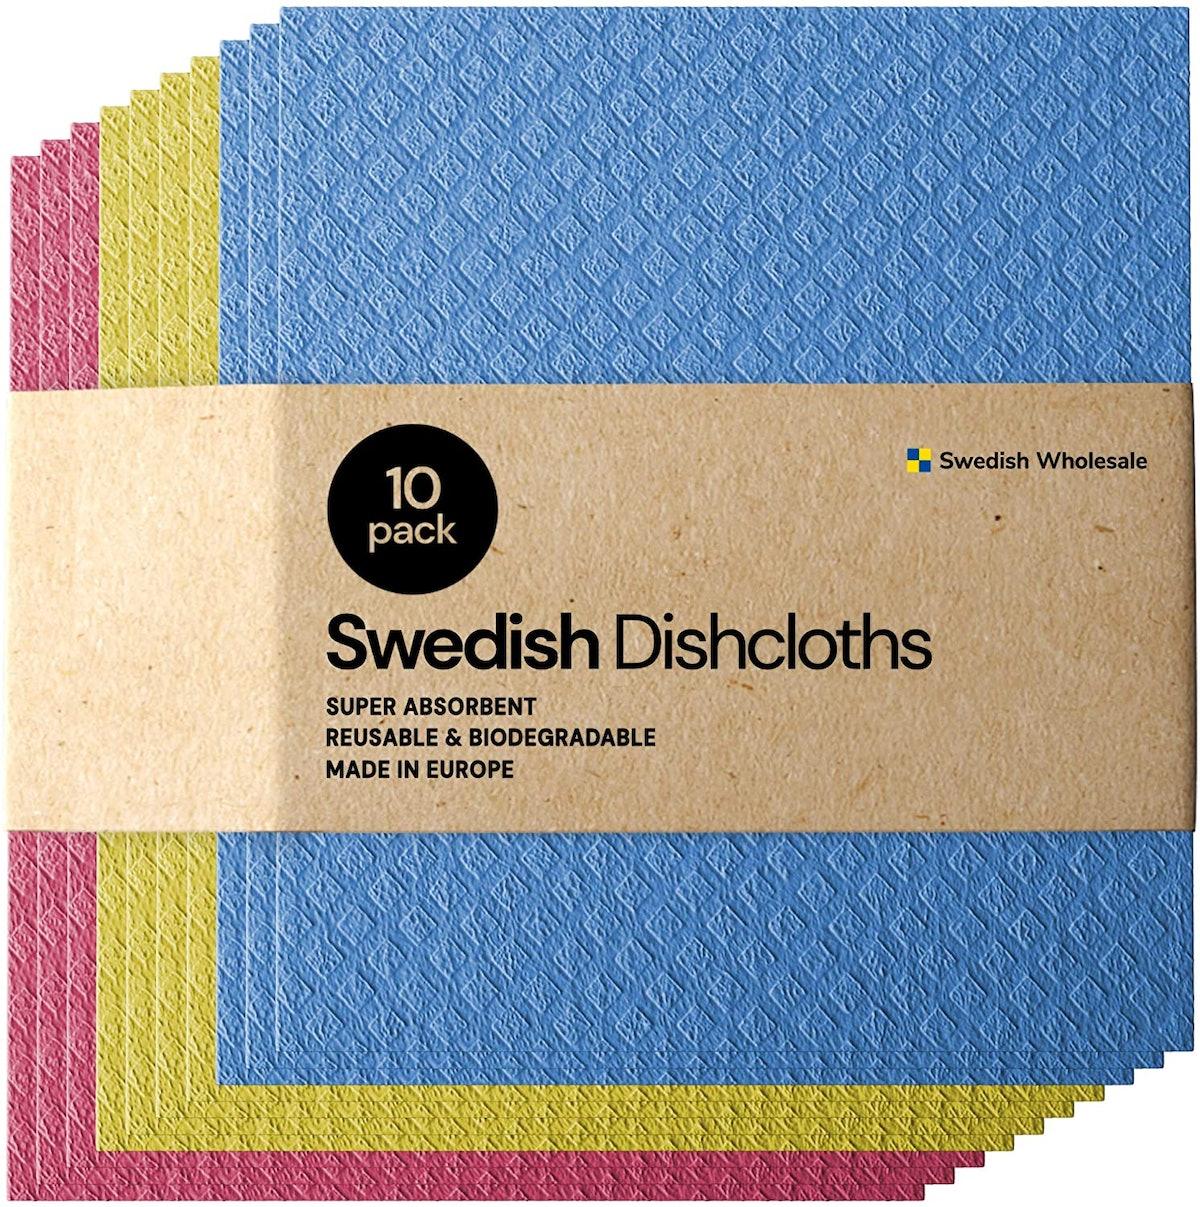 Swedish Wholesale No Odor Dishcloths (10 Pack)